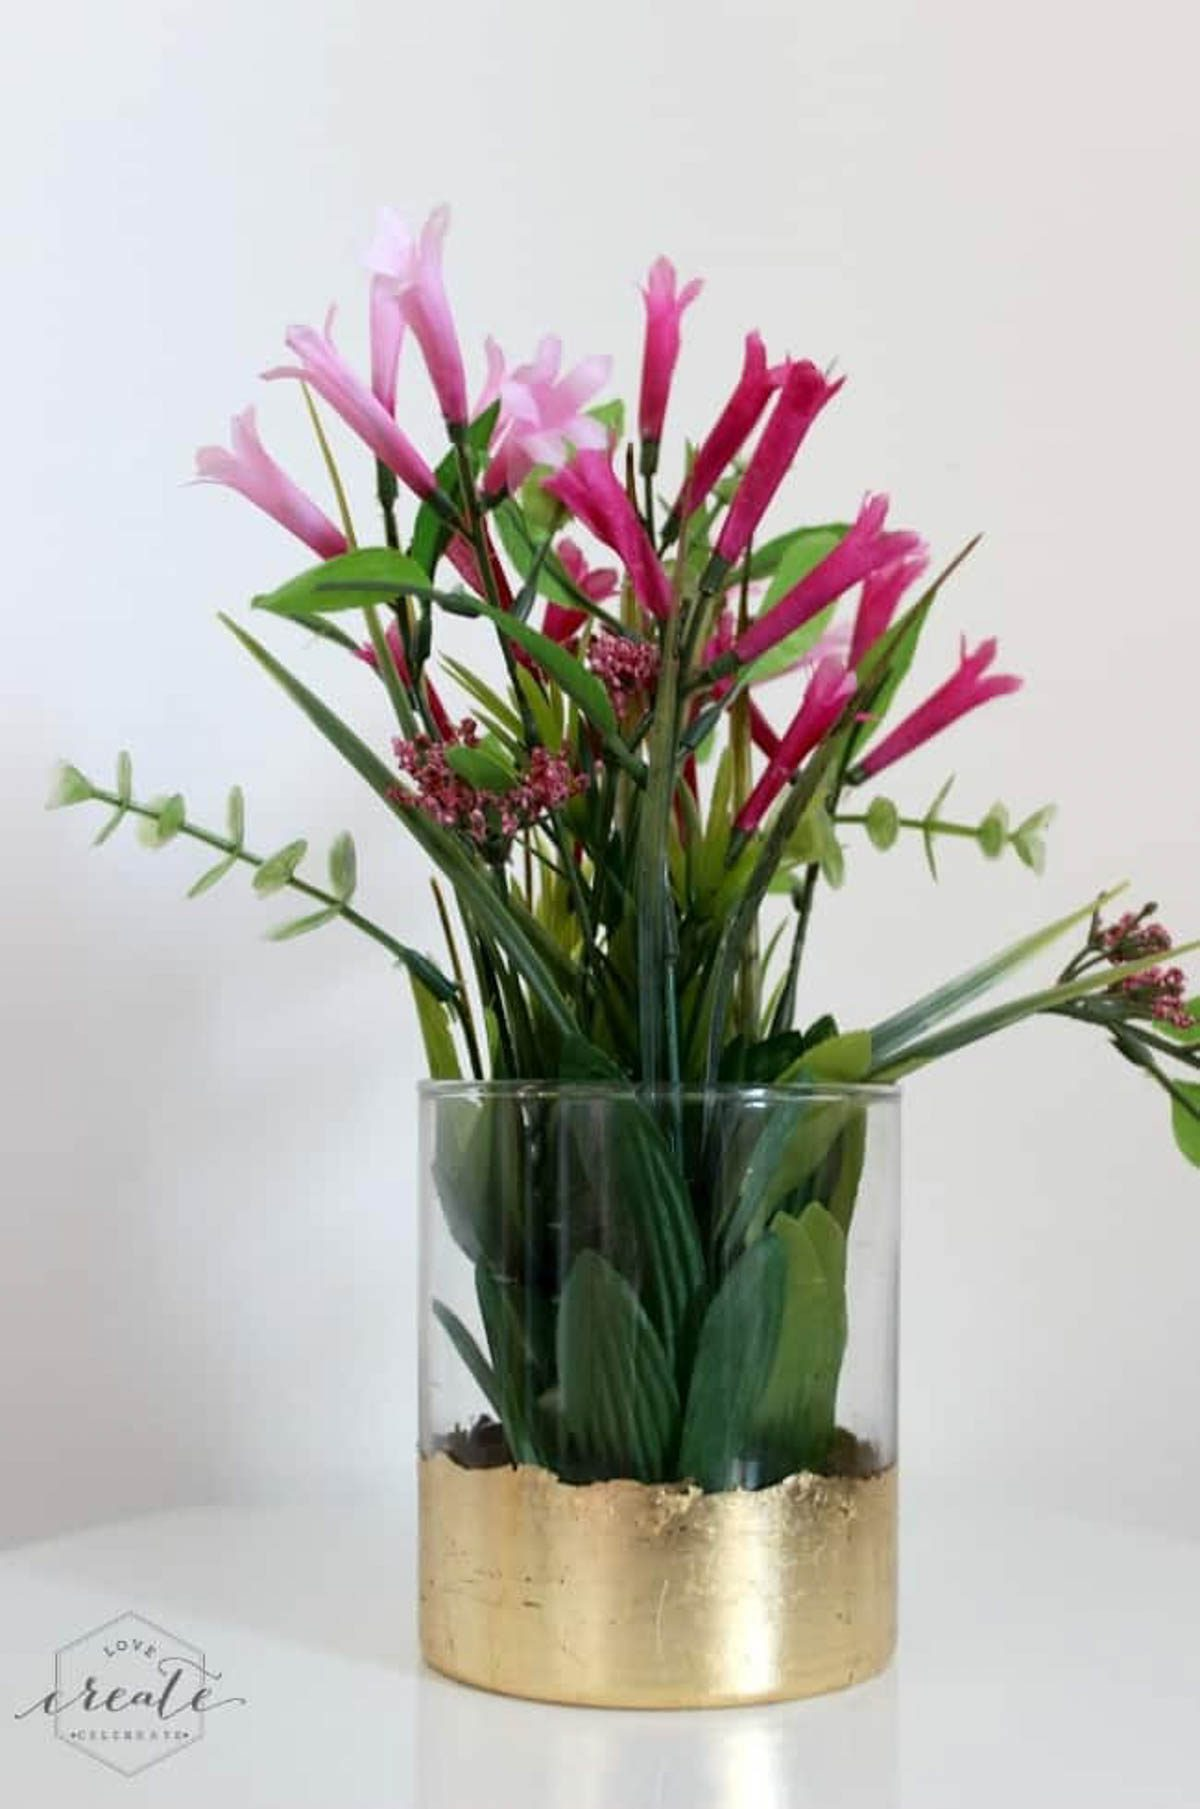 finished gold leaf vase with pink flowers